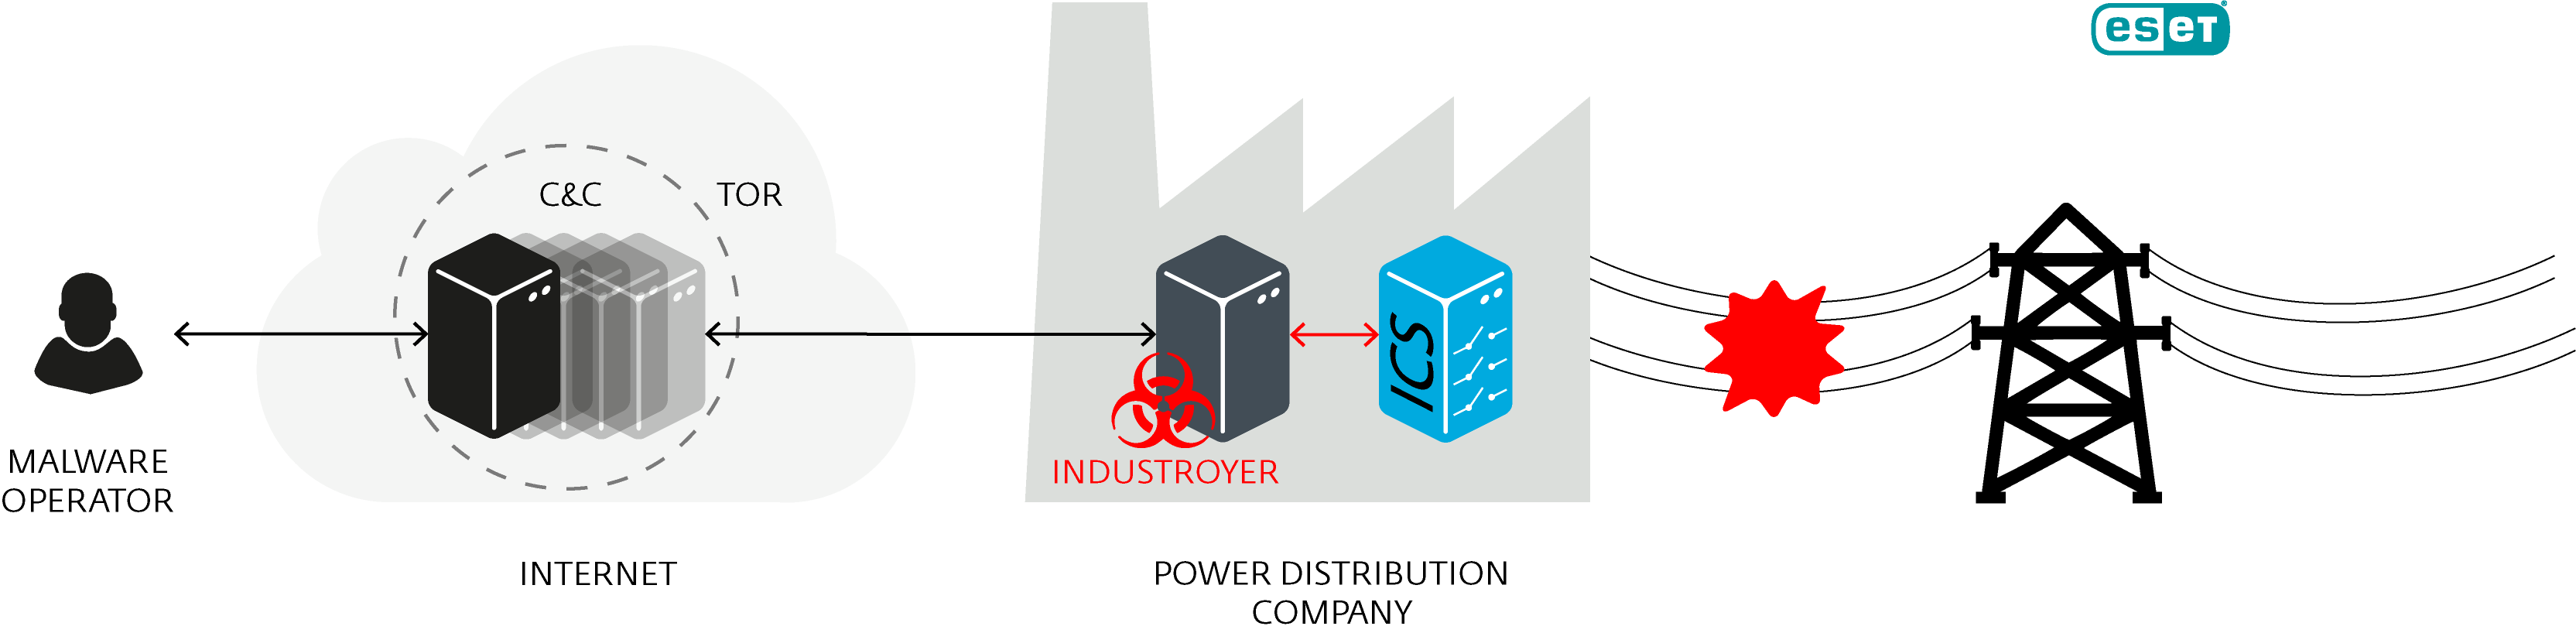 Industroyer, amenințare la adresa sistemelor industriale de control